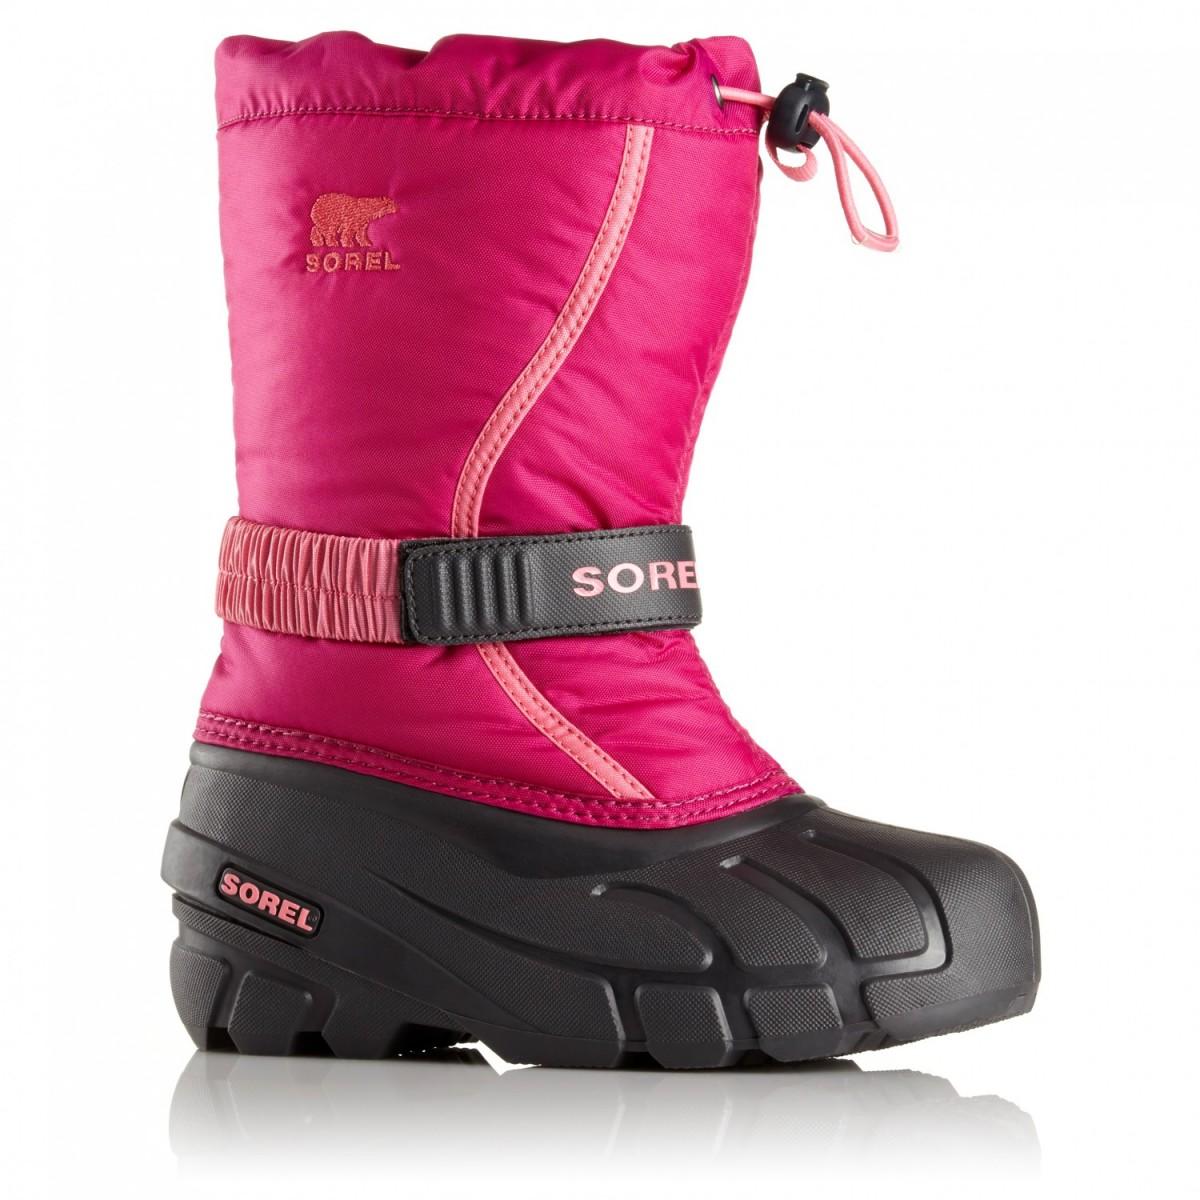 Sorel Childrens Flurry - scarpa neve bambina fuxia  994ebf35047